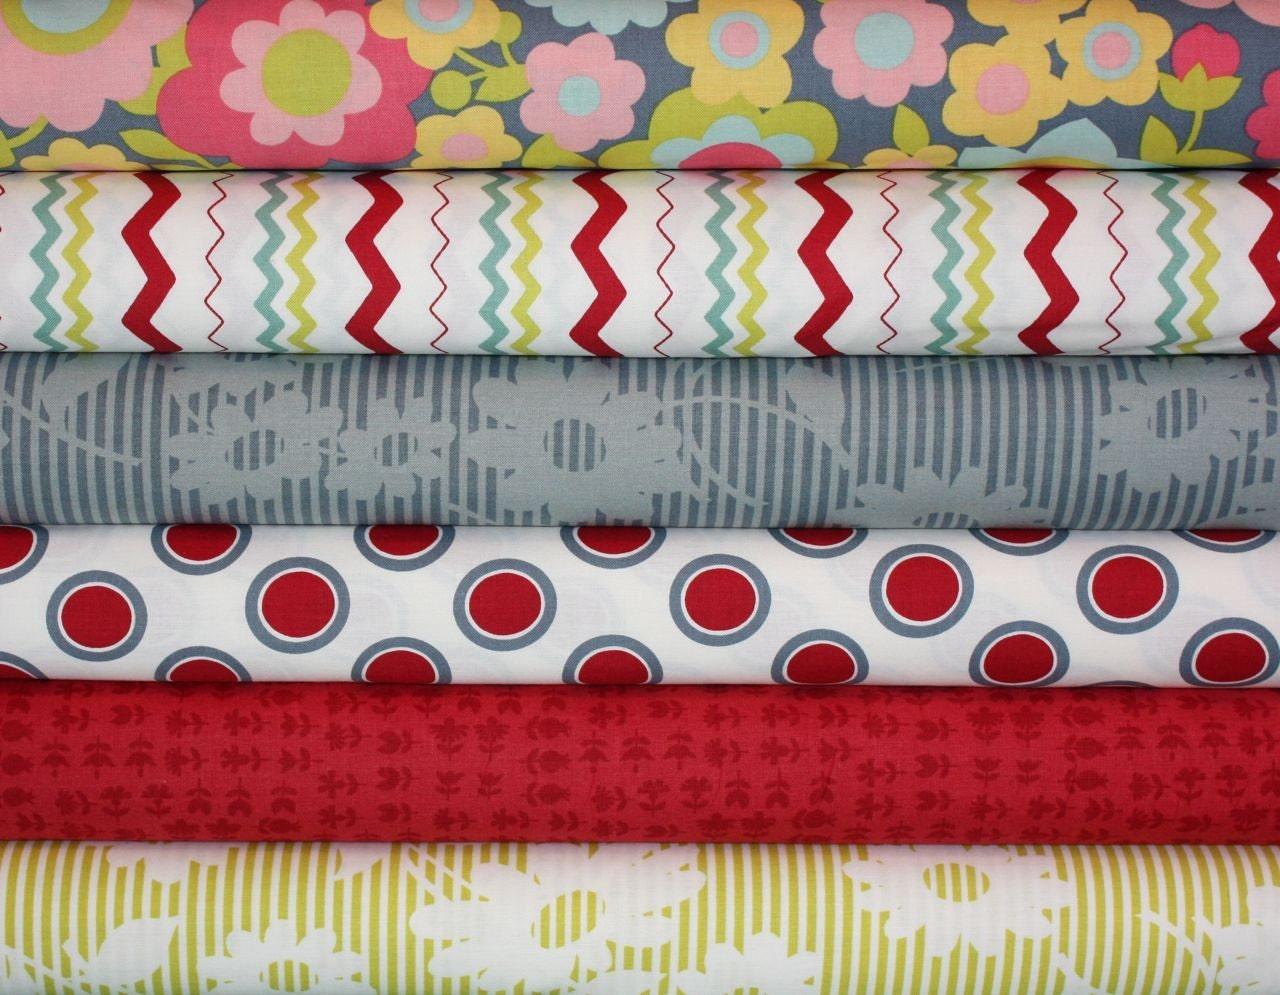 Hullabaloo Fabric by Urban Chiks for Moda Fabrics- Fat Quarter Bundle, 6 total